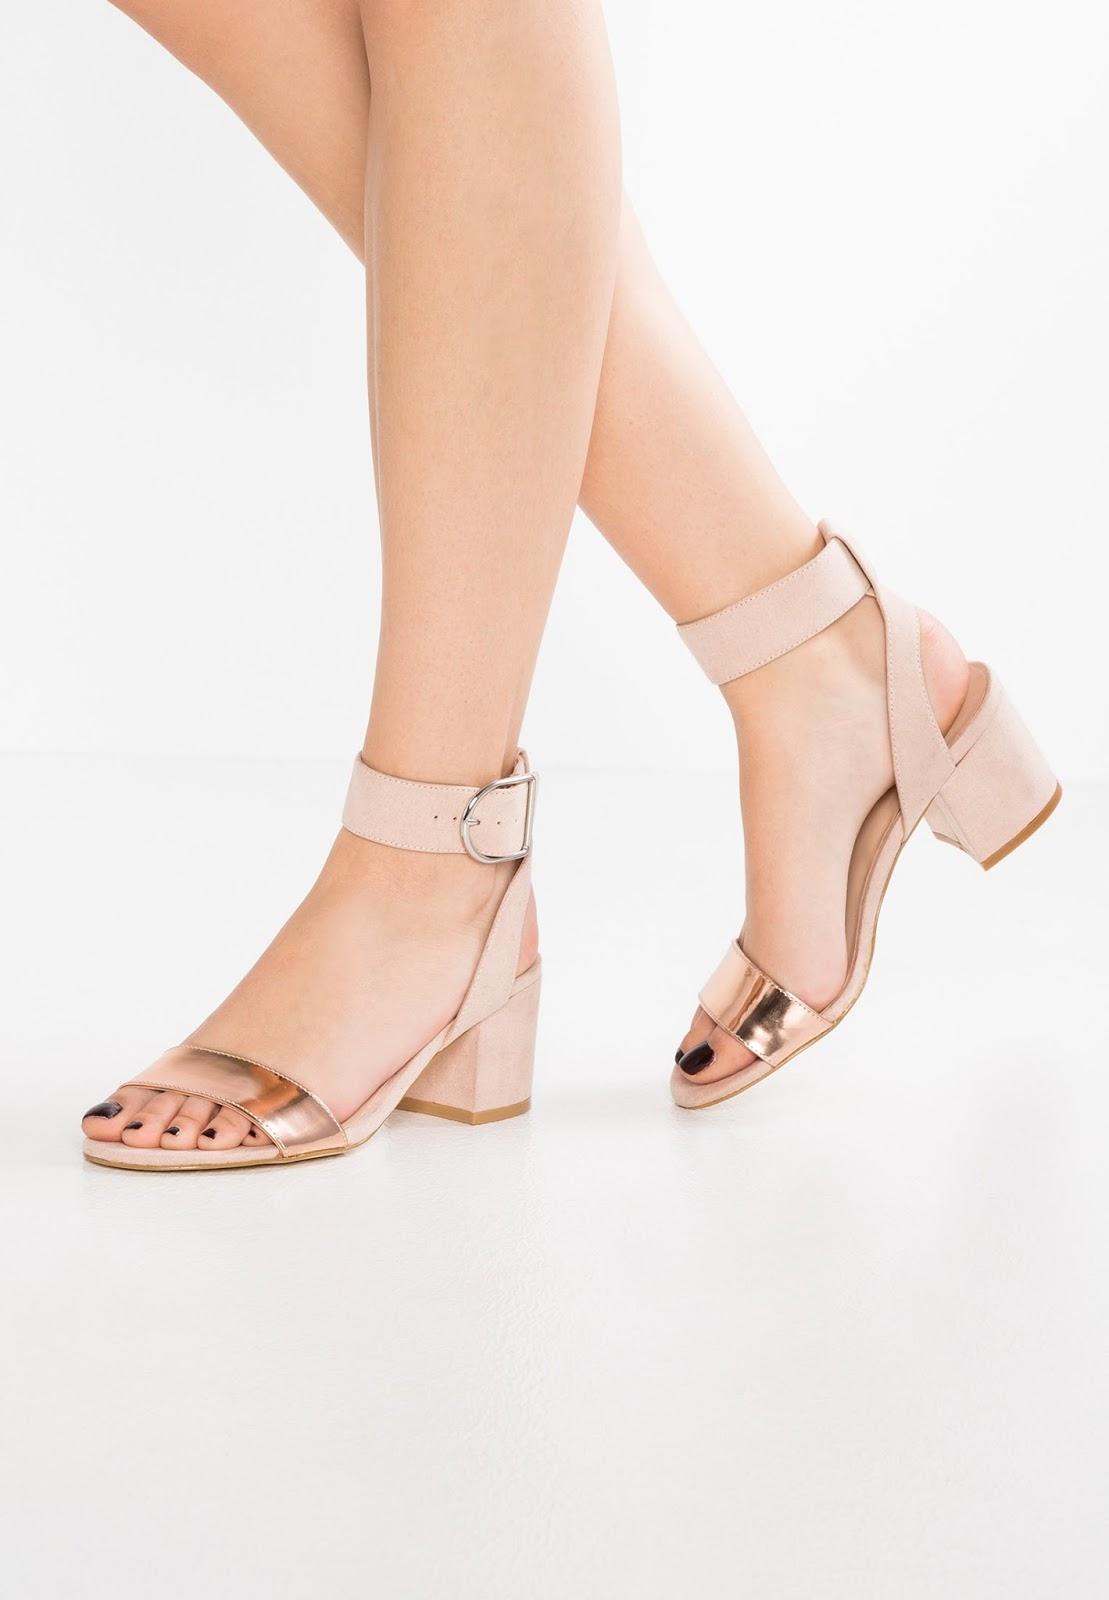 https://www.zalando.fr/evenandodd-sandales-nude-ev411a0a6-j11.html?zoom=true